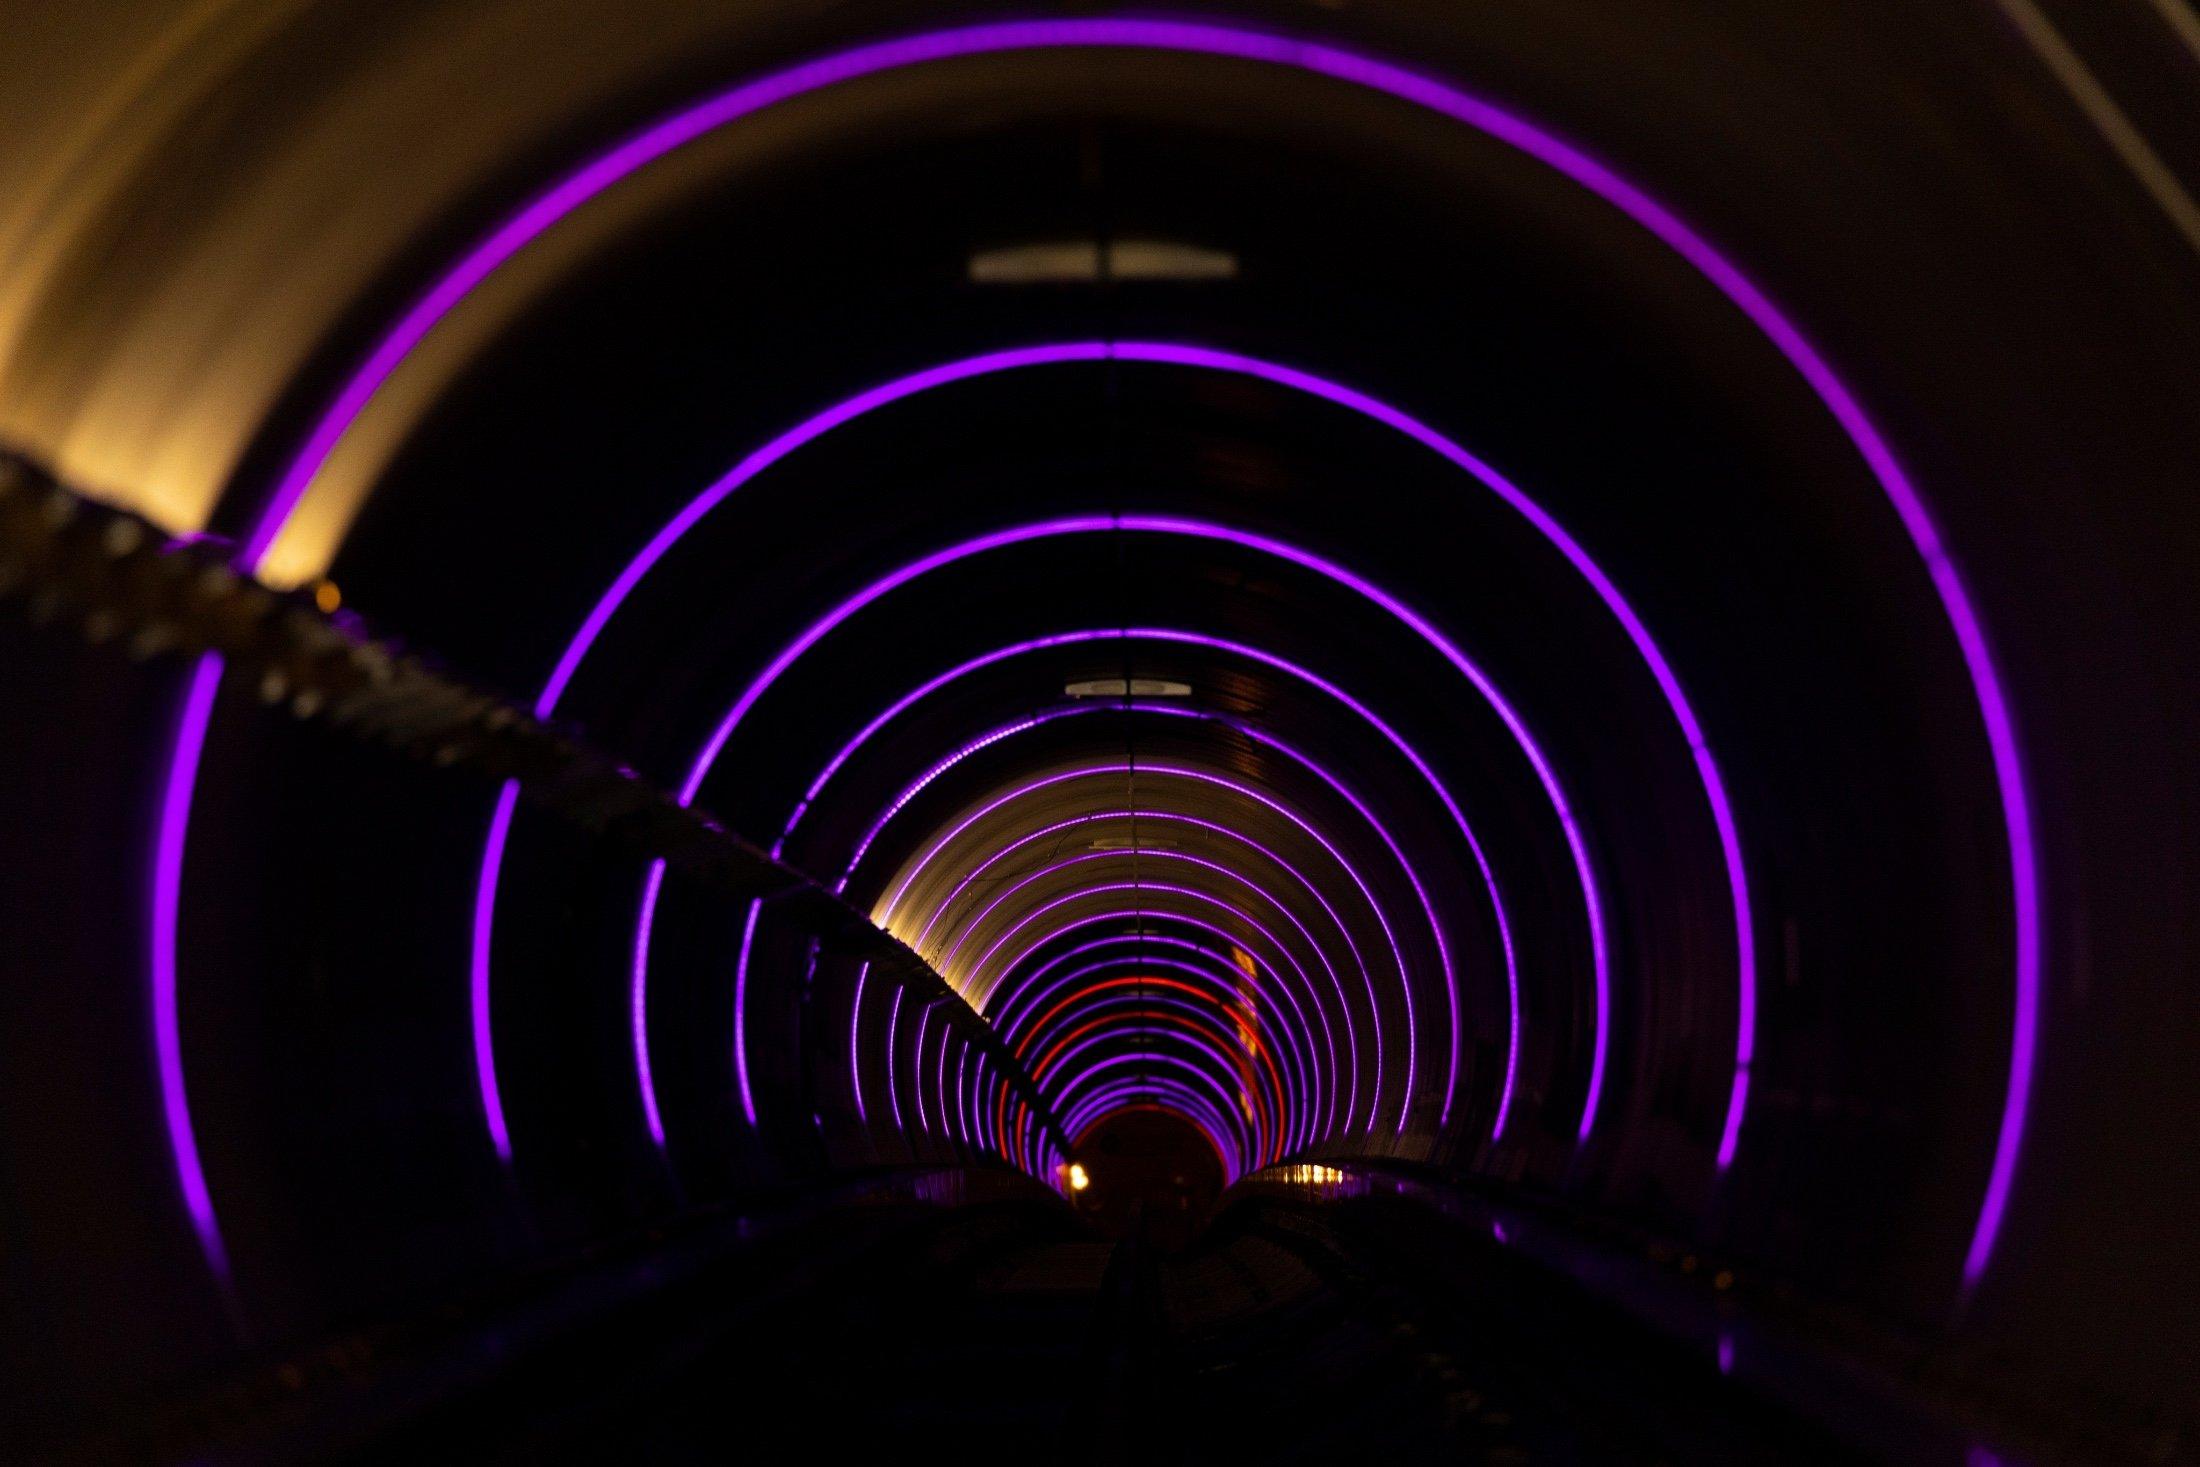 The inside of a test hyperloop tube is seen at the Virgin Hyperloop facility near Las Vegas, Nevada, U.S., May 5, 2021. (Reuters Photo)